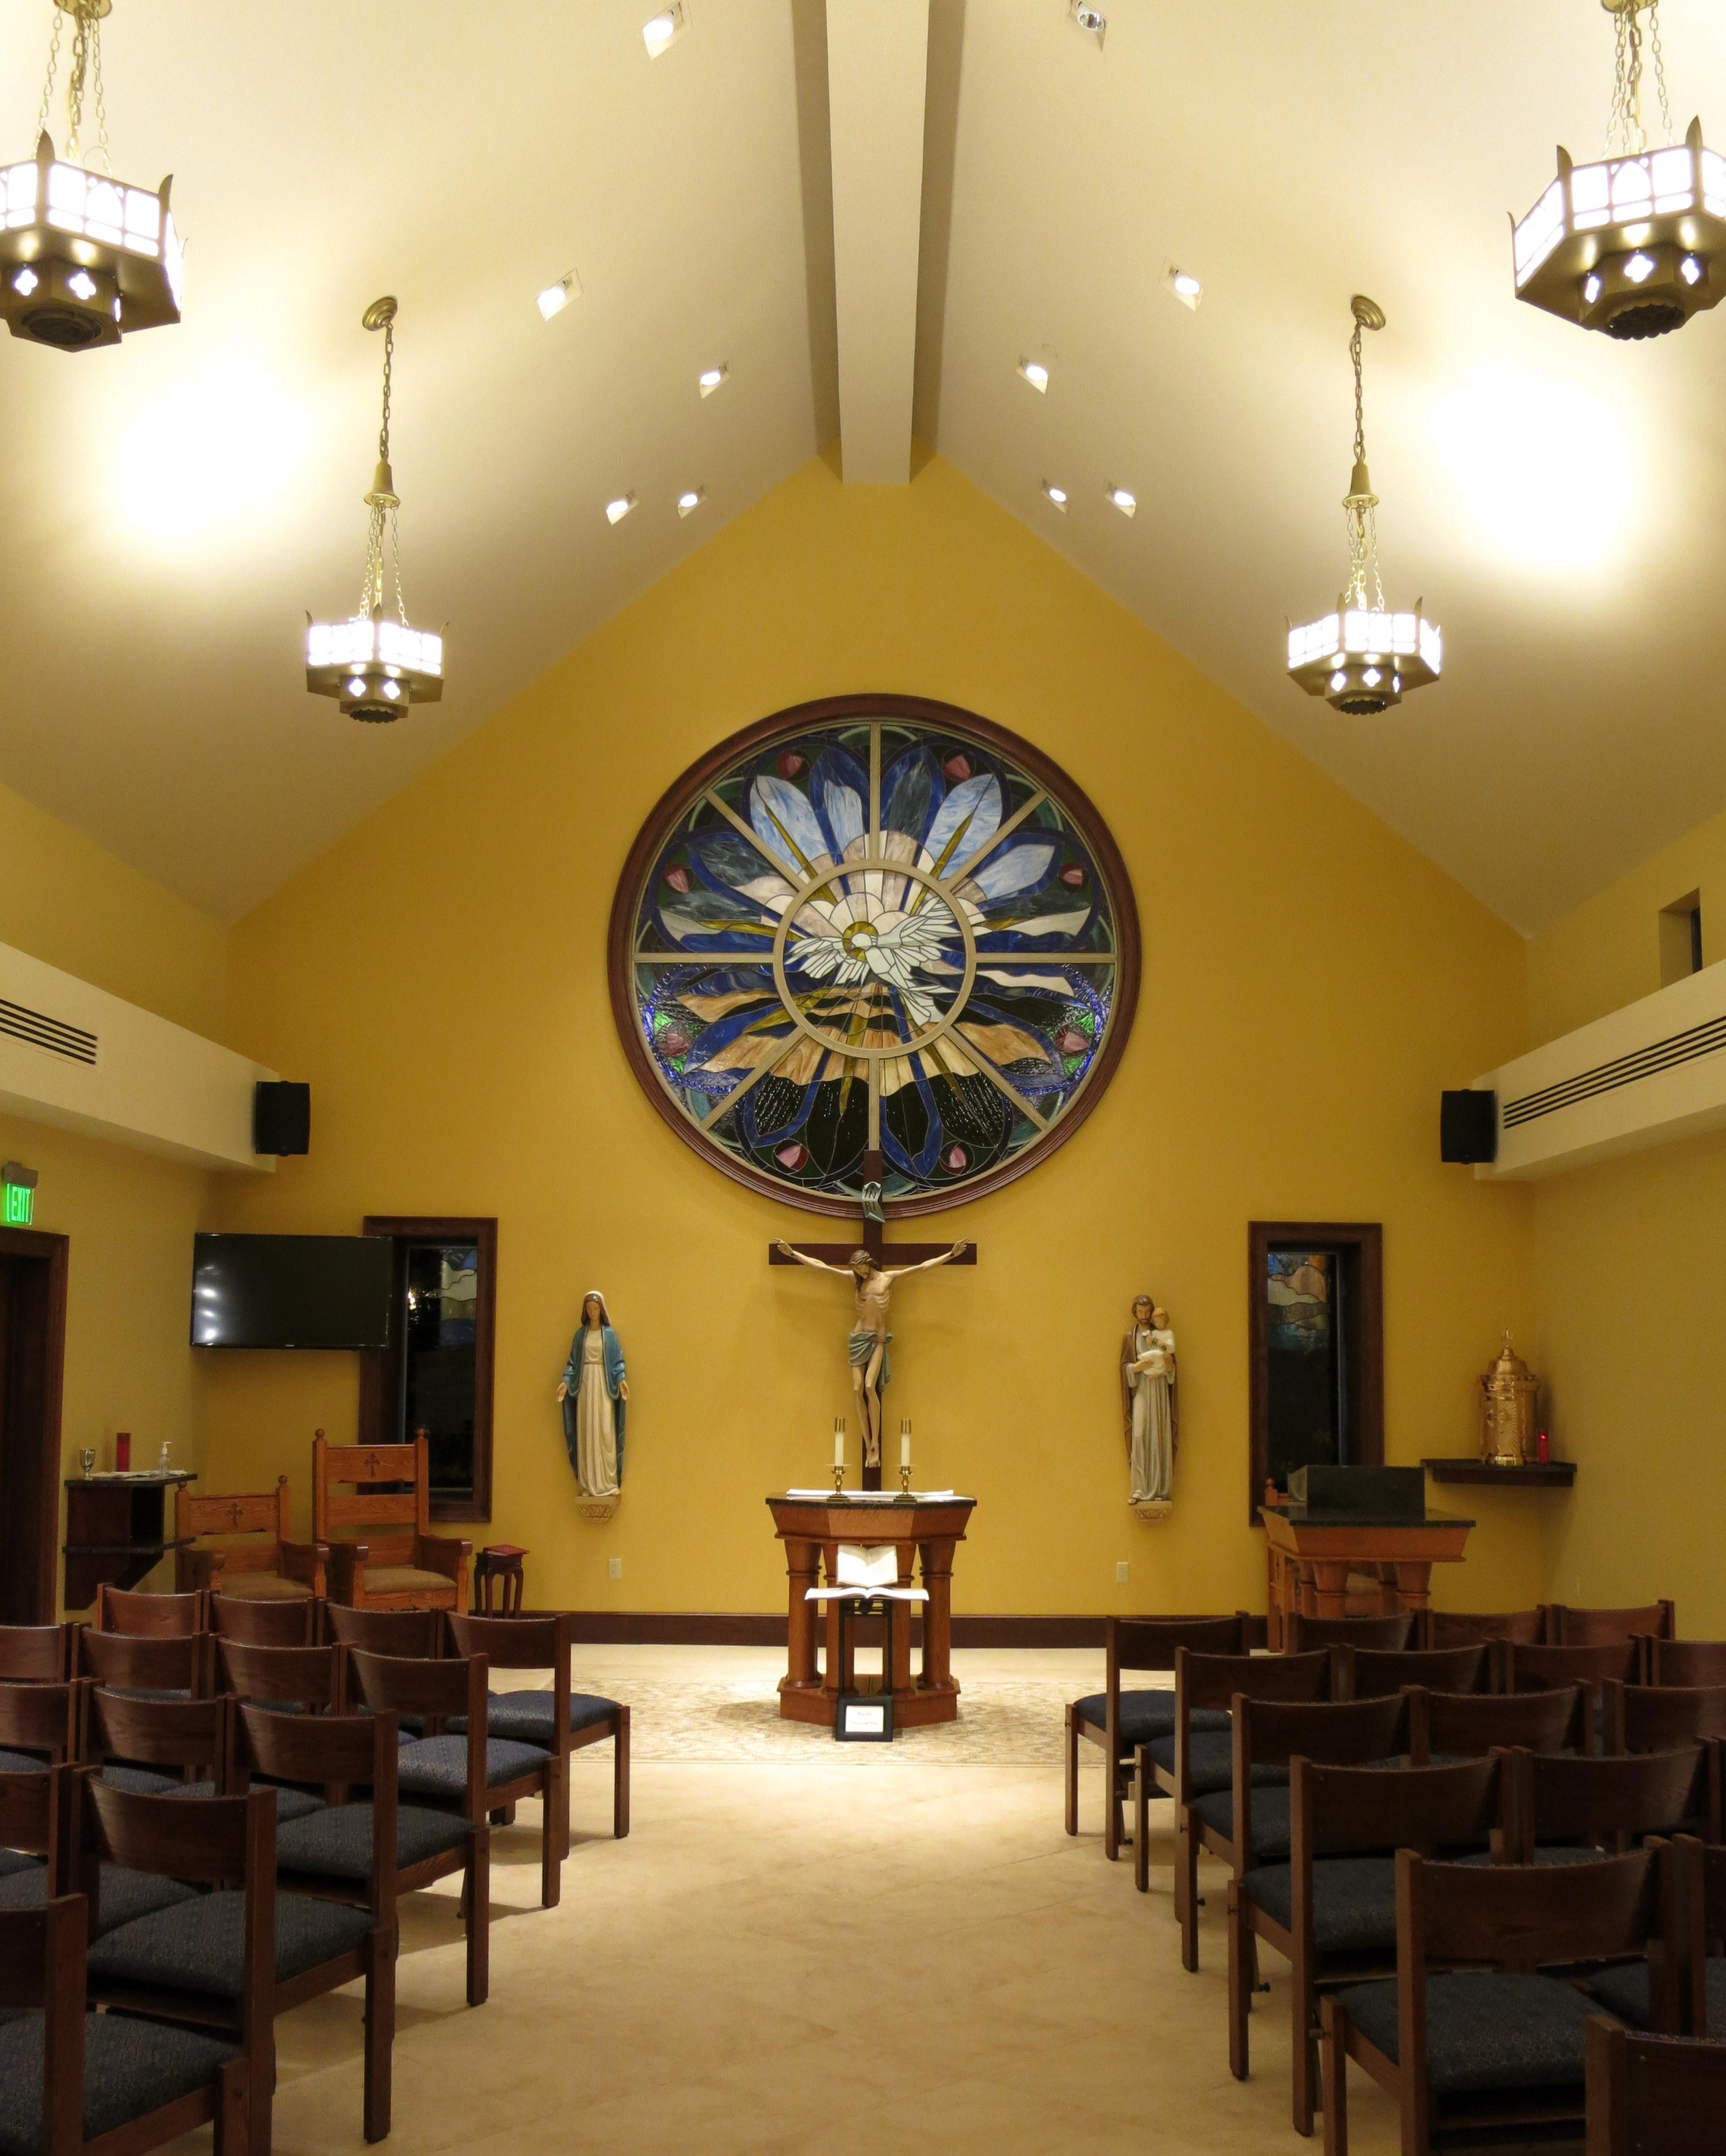 Filesaint John Neumann Catholic Church Sunbury Ohio Daily Mass Chapel